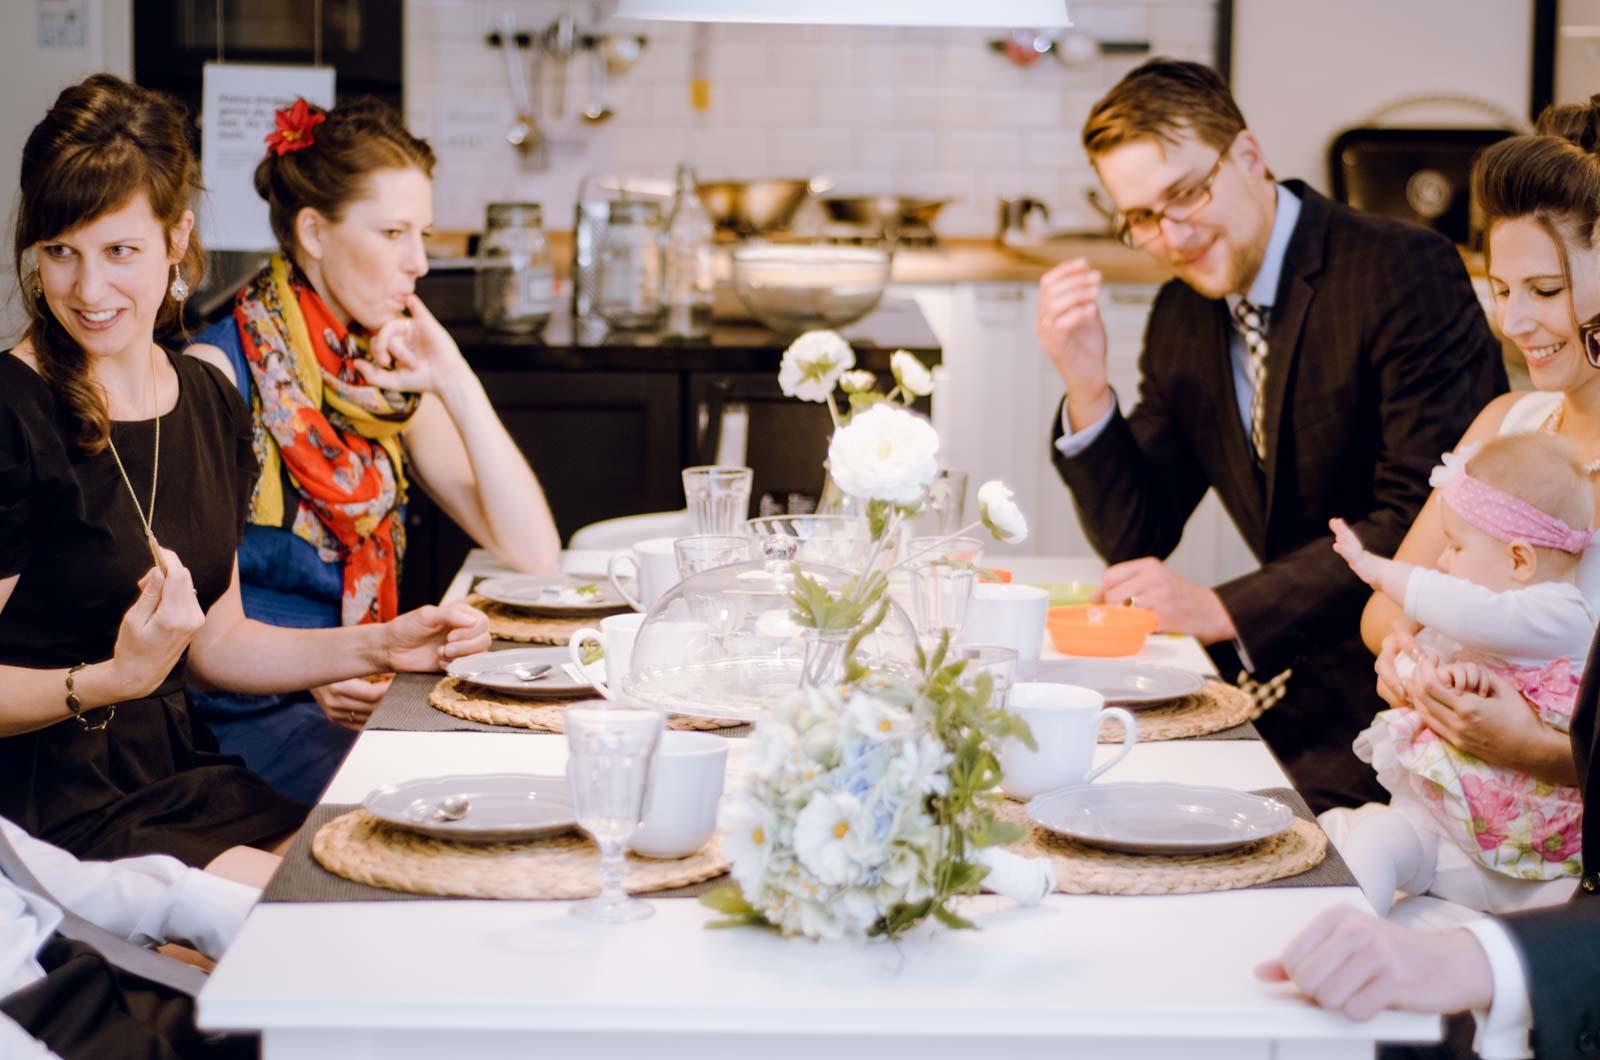 hochzeit ikea heiraten flughafen koeln ossendorf hochzeitsfotograf koeln 35 jenny egerer k ln. Black Bedroom Furniture Sets. Home Design Ideas